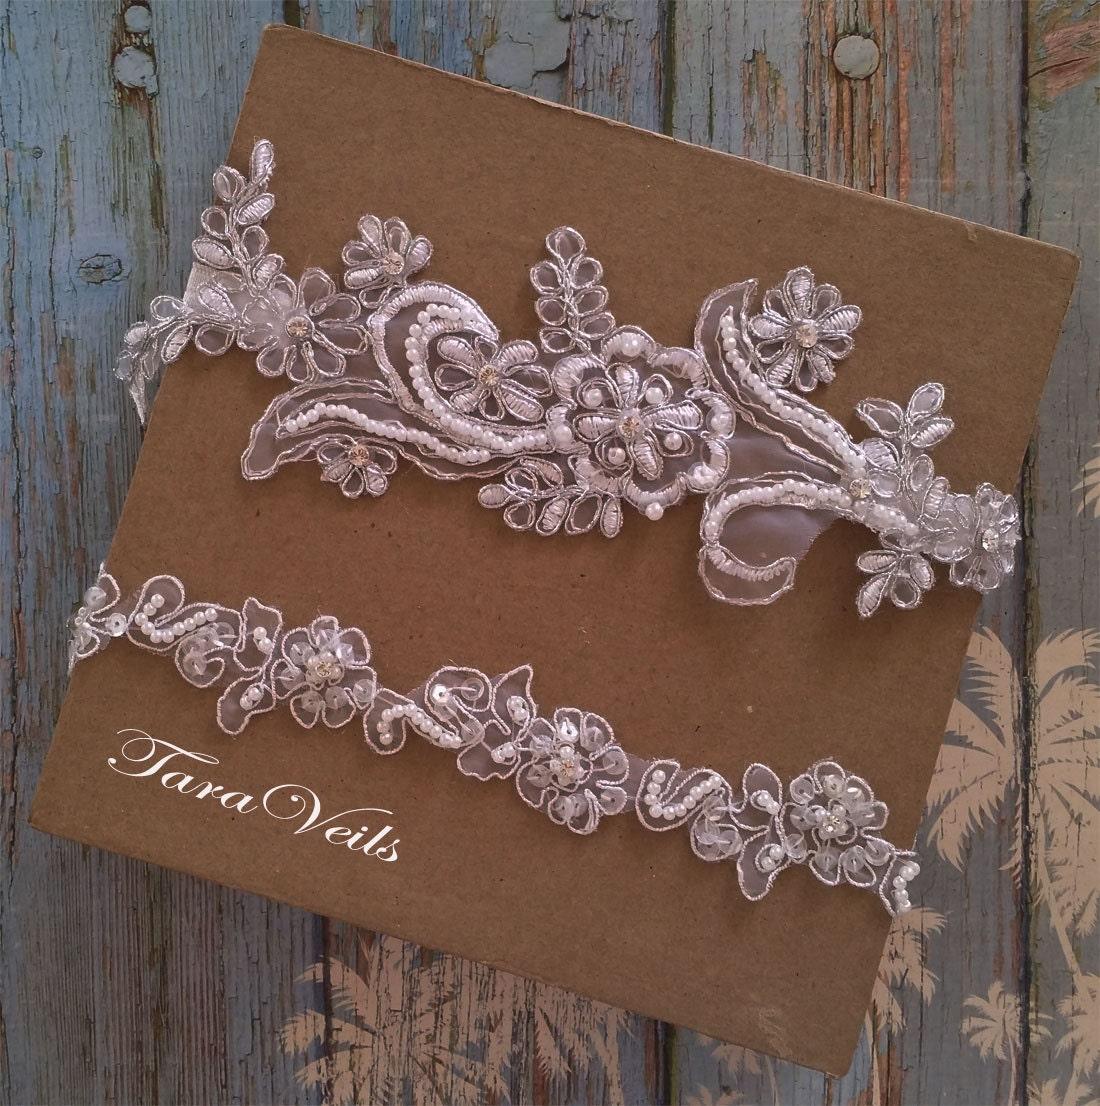 Tradition Of Wedding Garter: Wedding Garter Set White Silver GarterRhinestone White